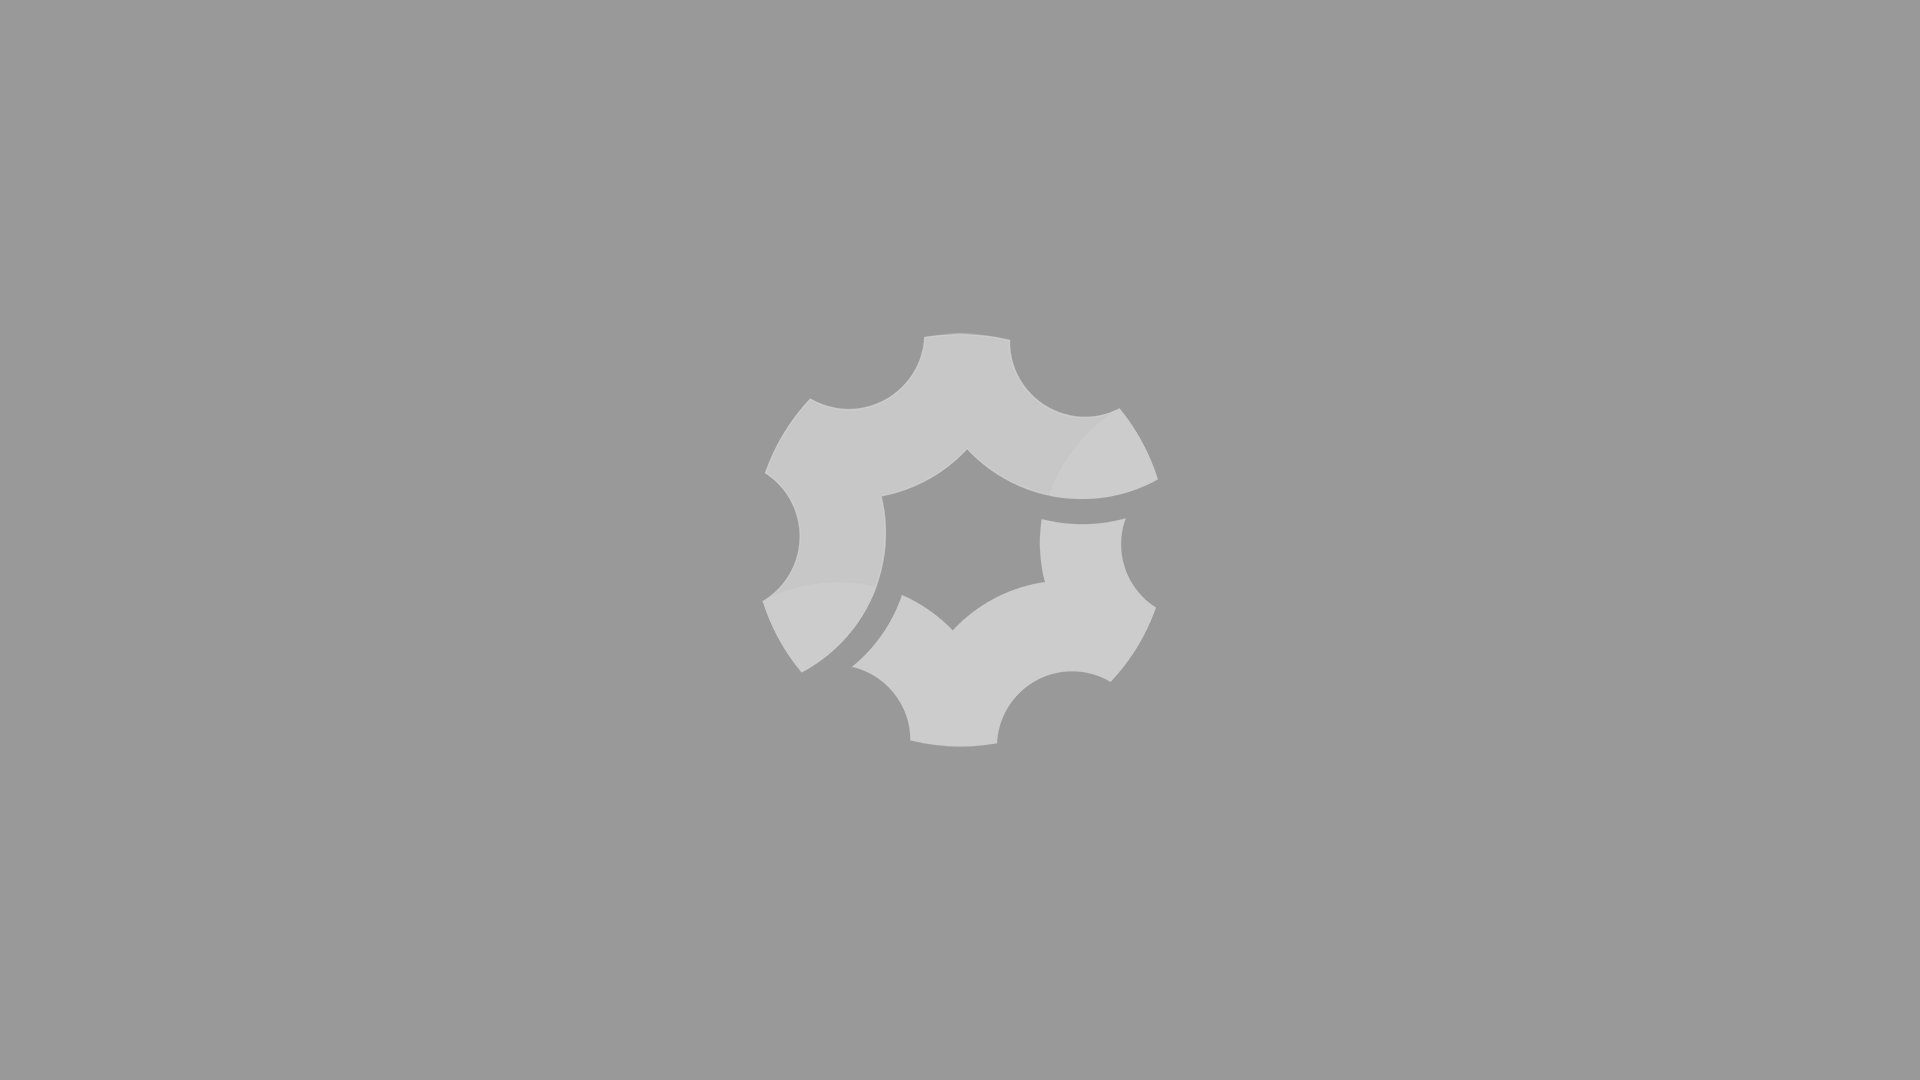 new_bitmap_image2.jpg_tsshumb.png